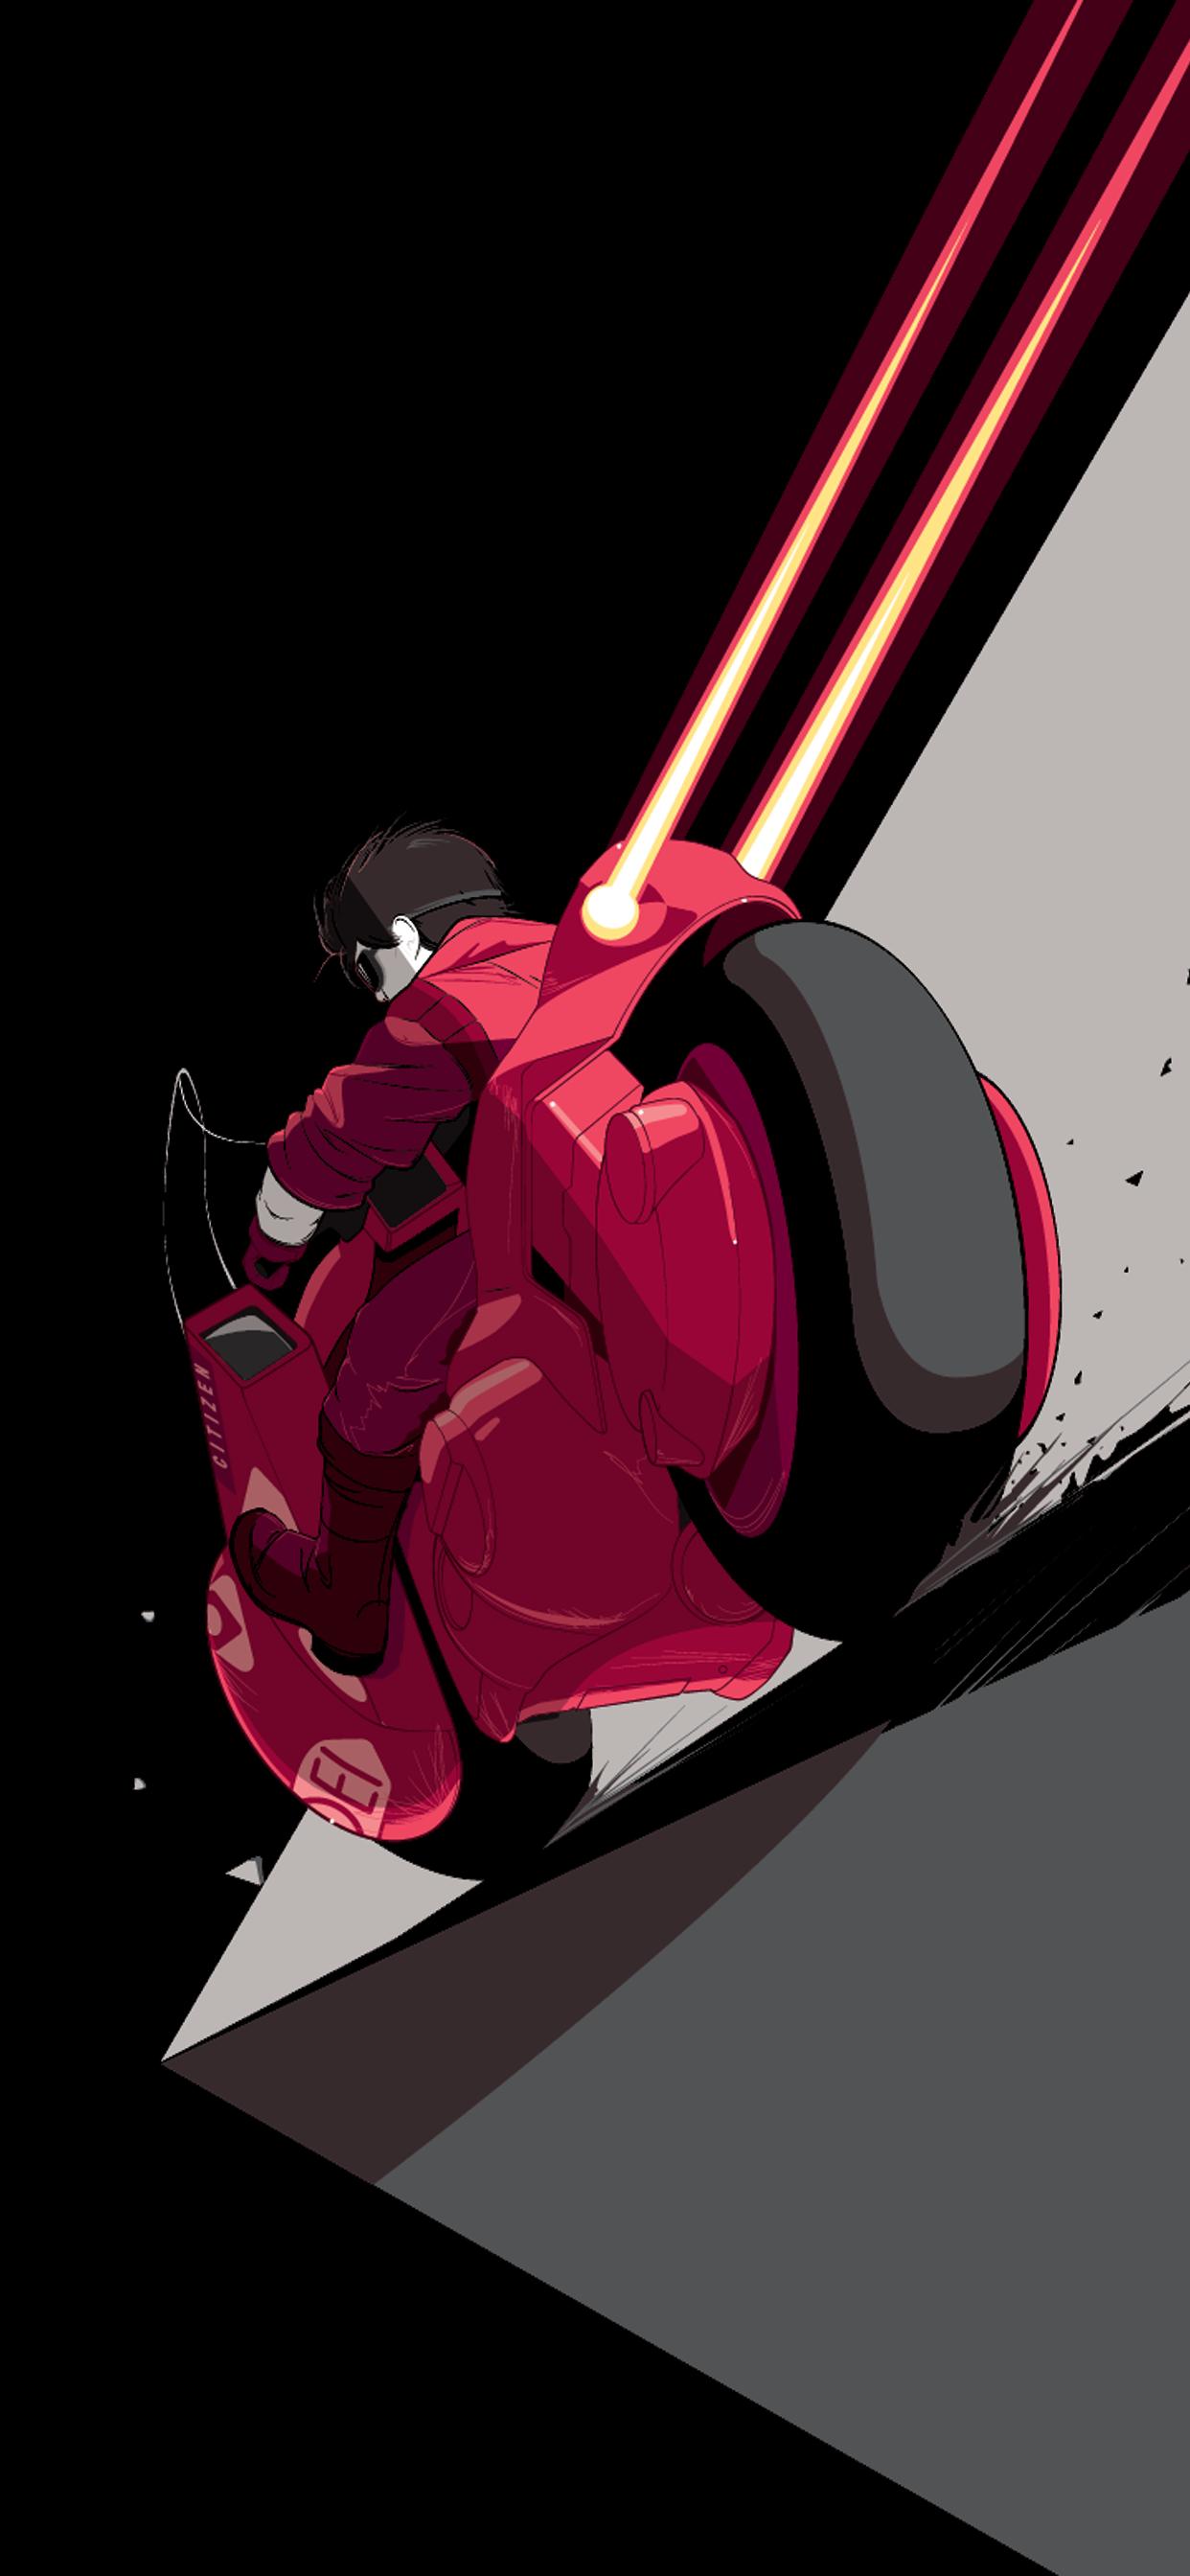 Akira Anime Wallpaper Iphone Heroscreen Cool Wallpapers